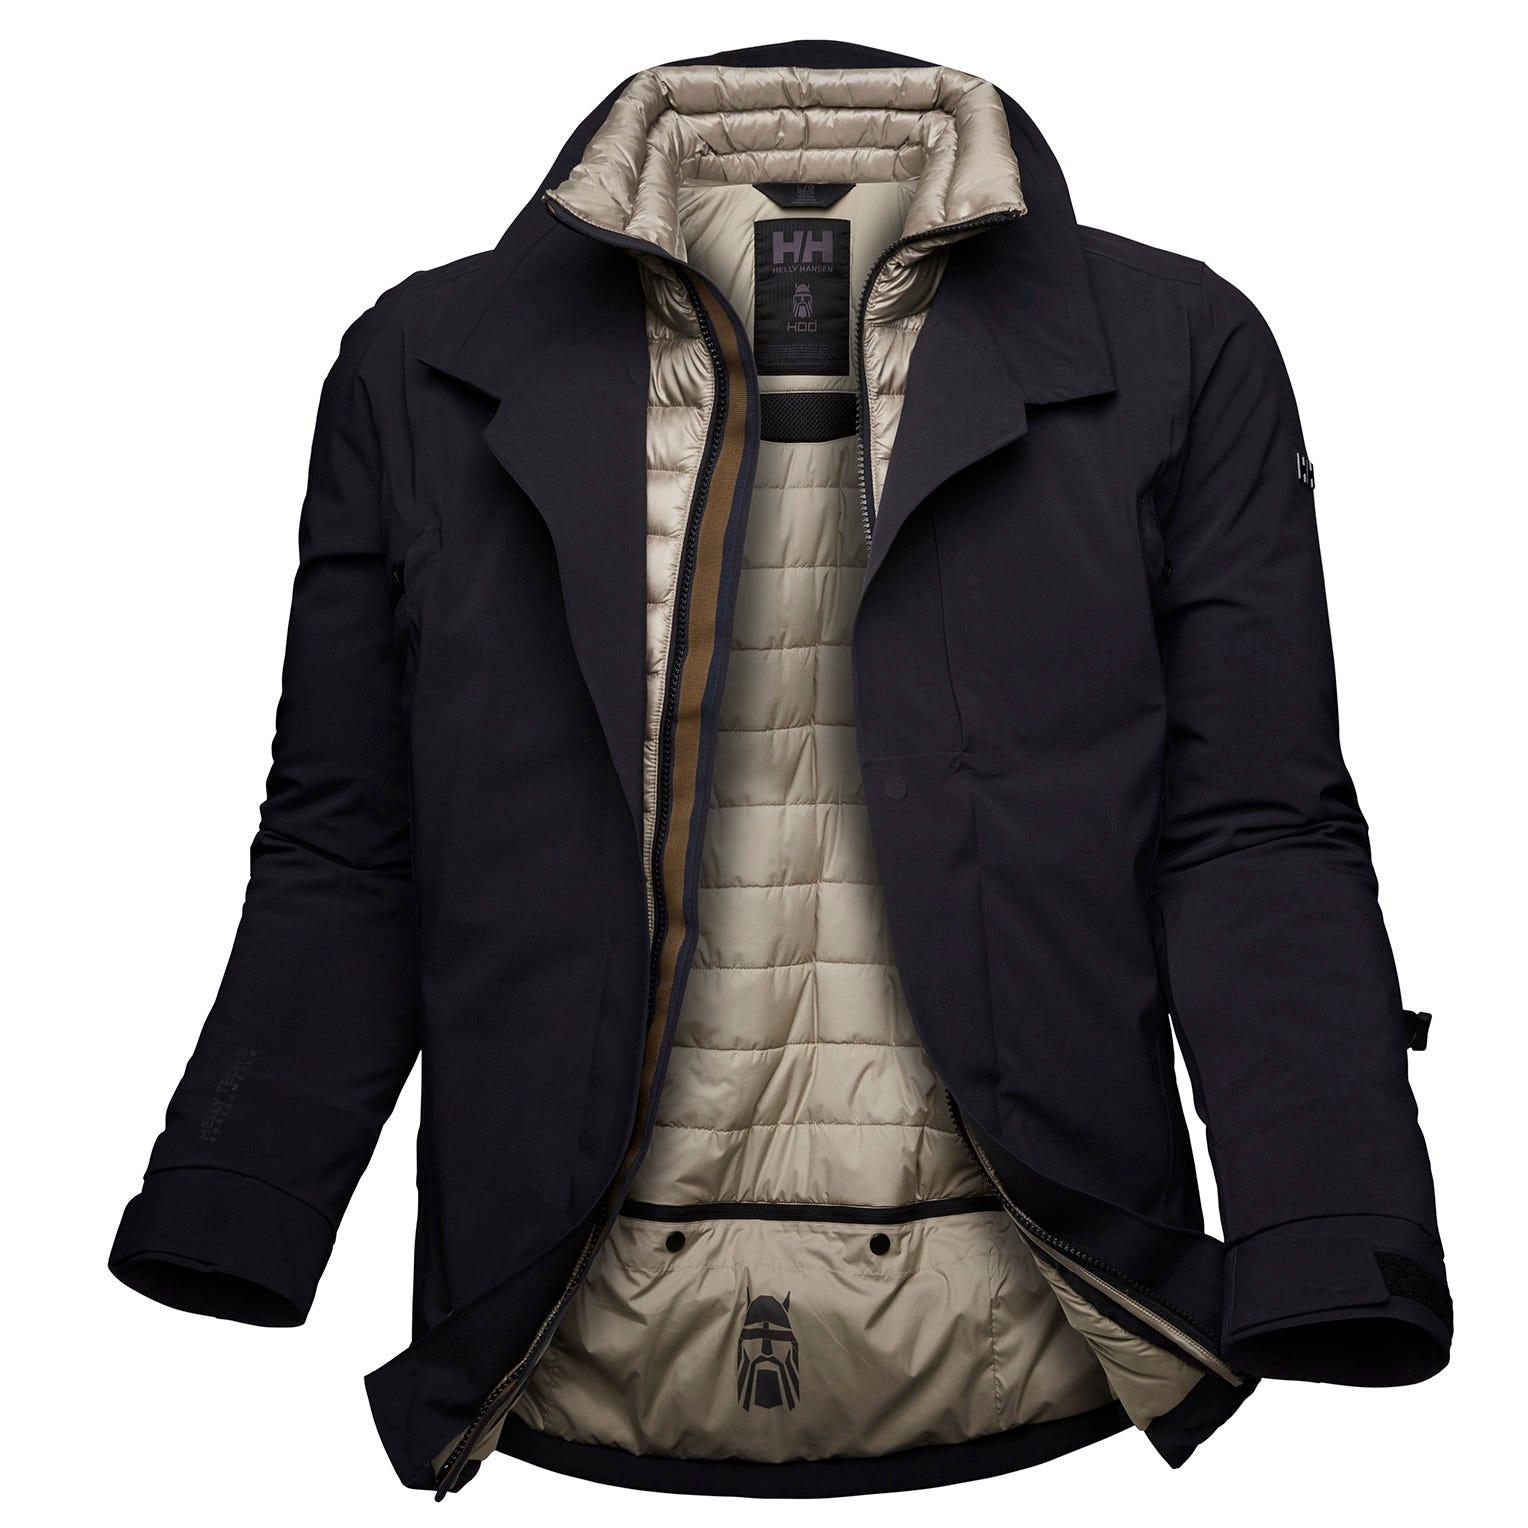 Helly Hansen Icon 3.0 Jacket L Black